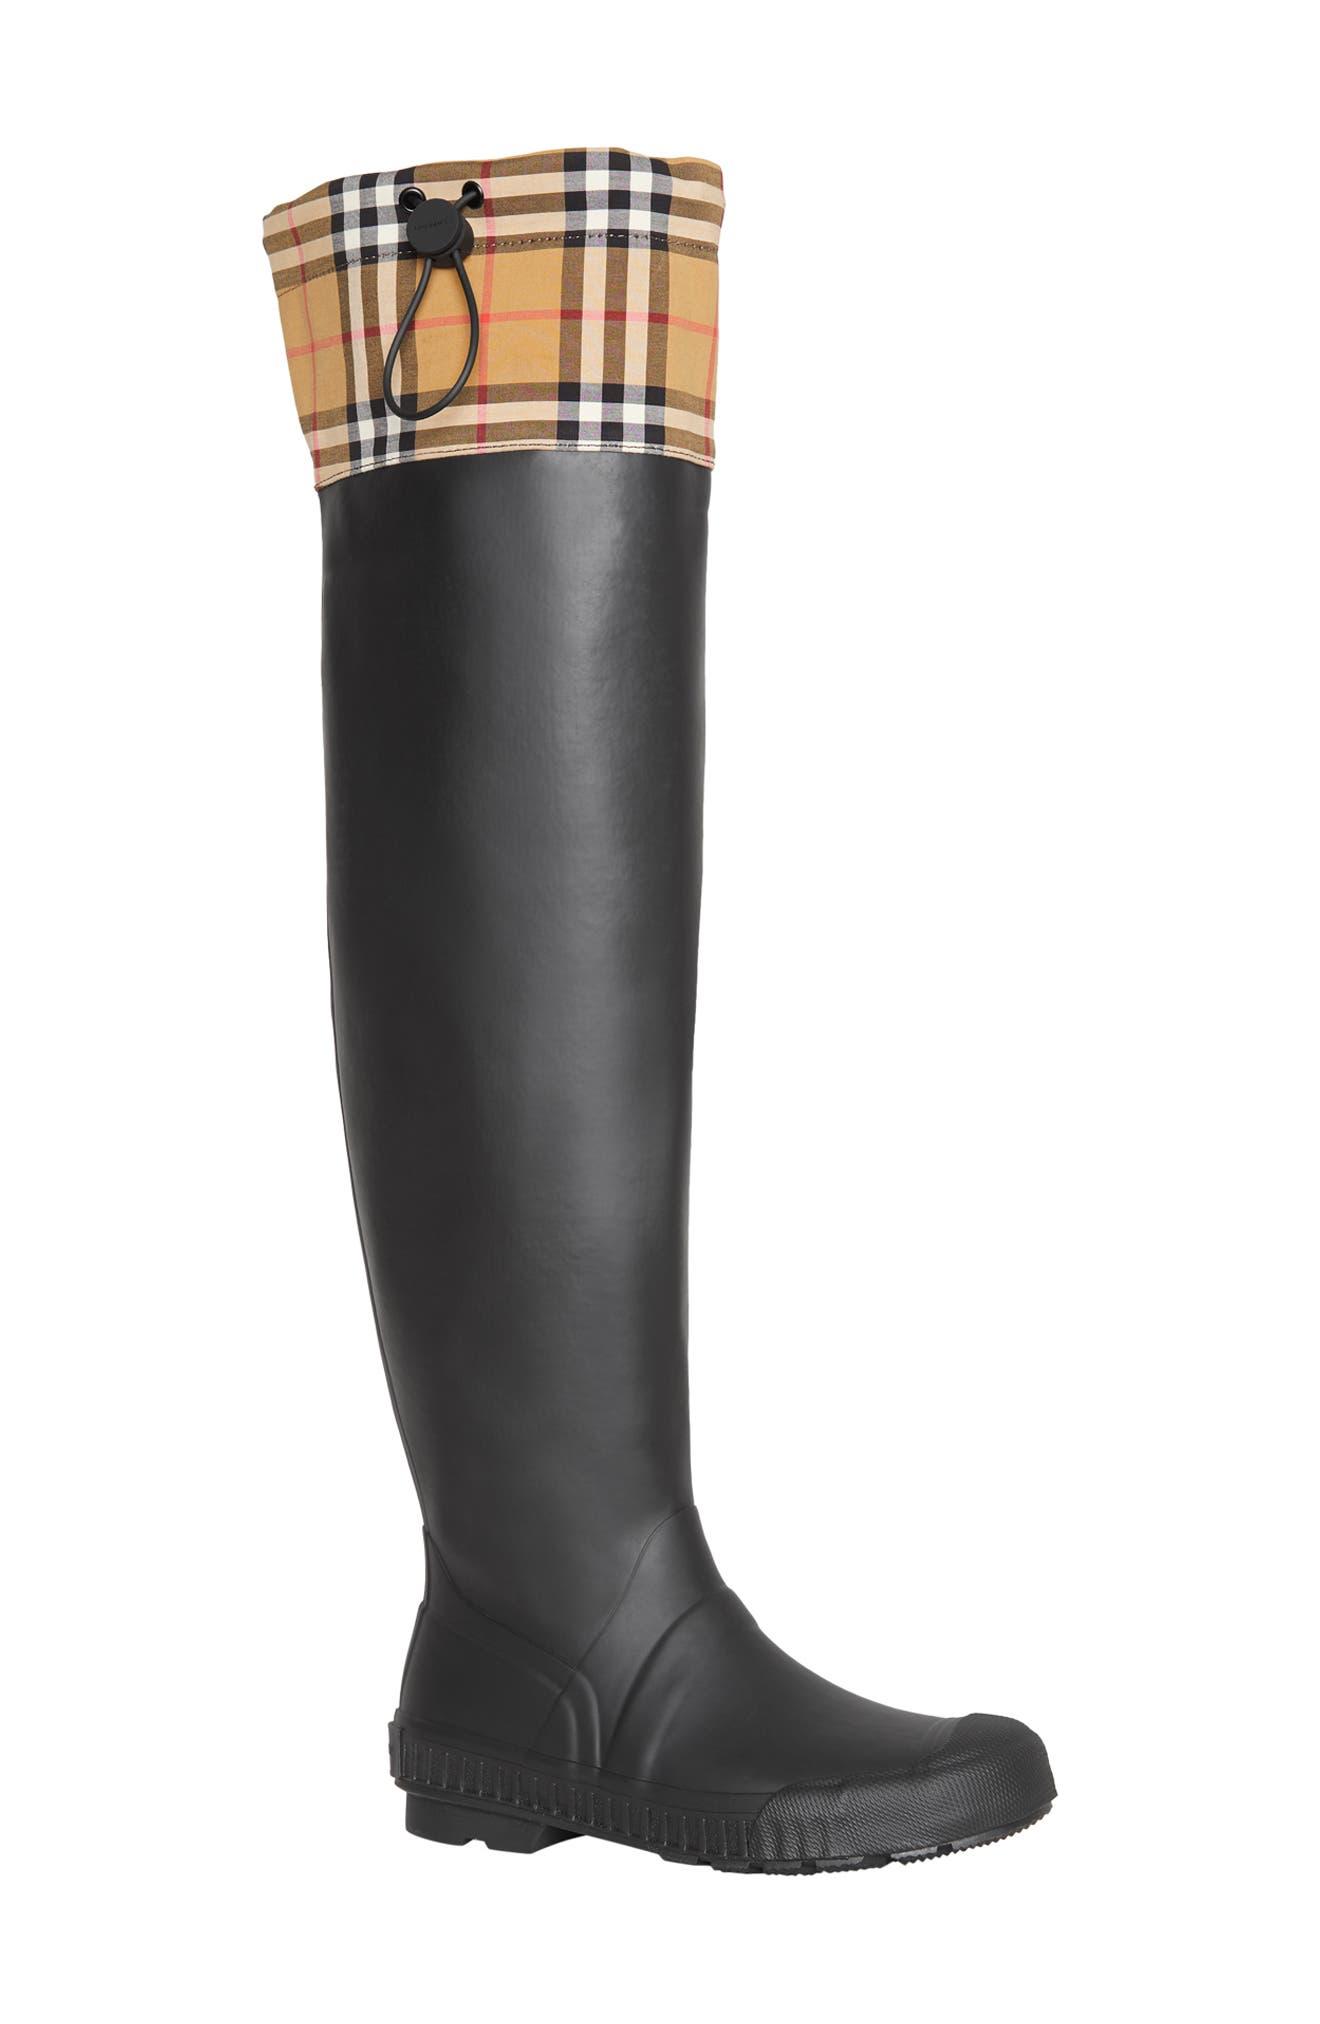 BURBERRY,                             Freddie Tall Waterproof Rain Boot,                             Main thumbnail 1, color,                             BLACK